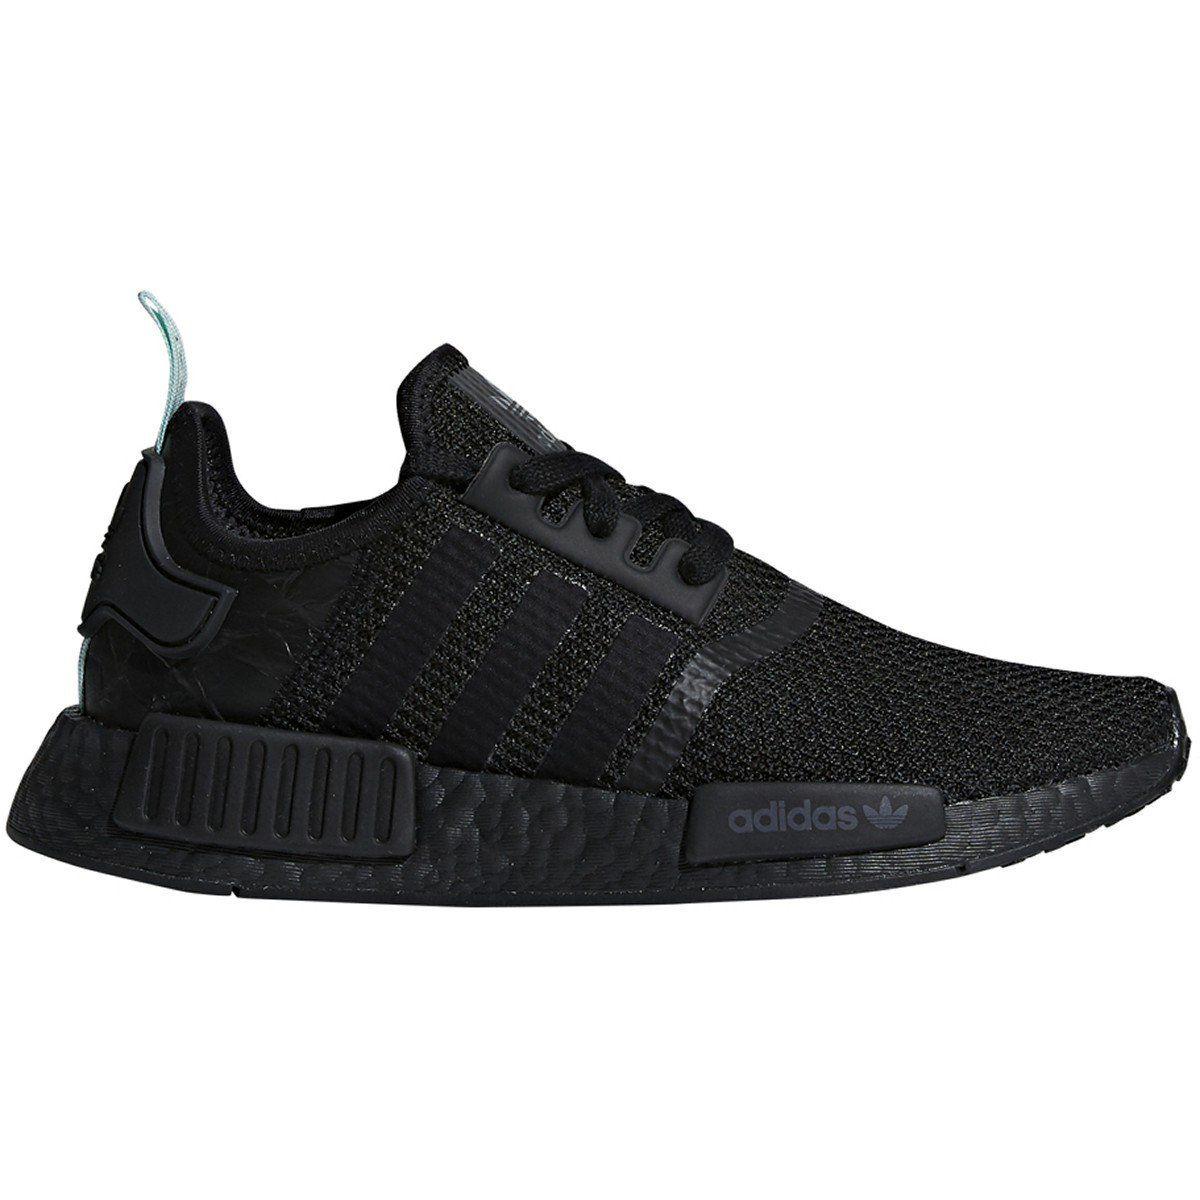 adidas women's nmd r1 black